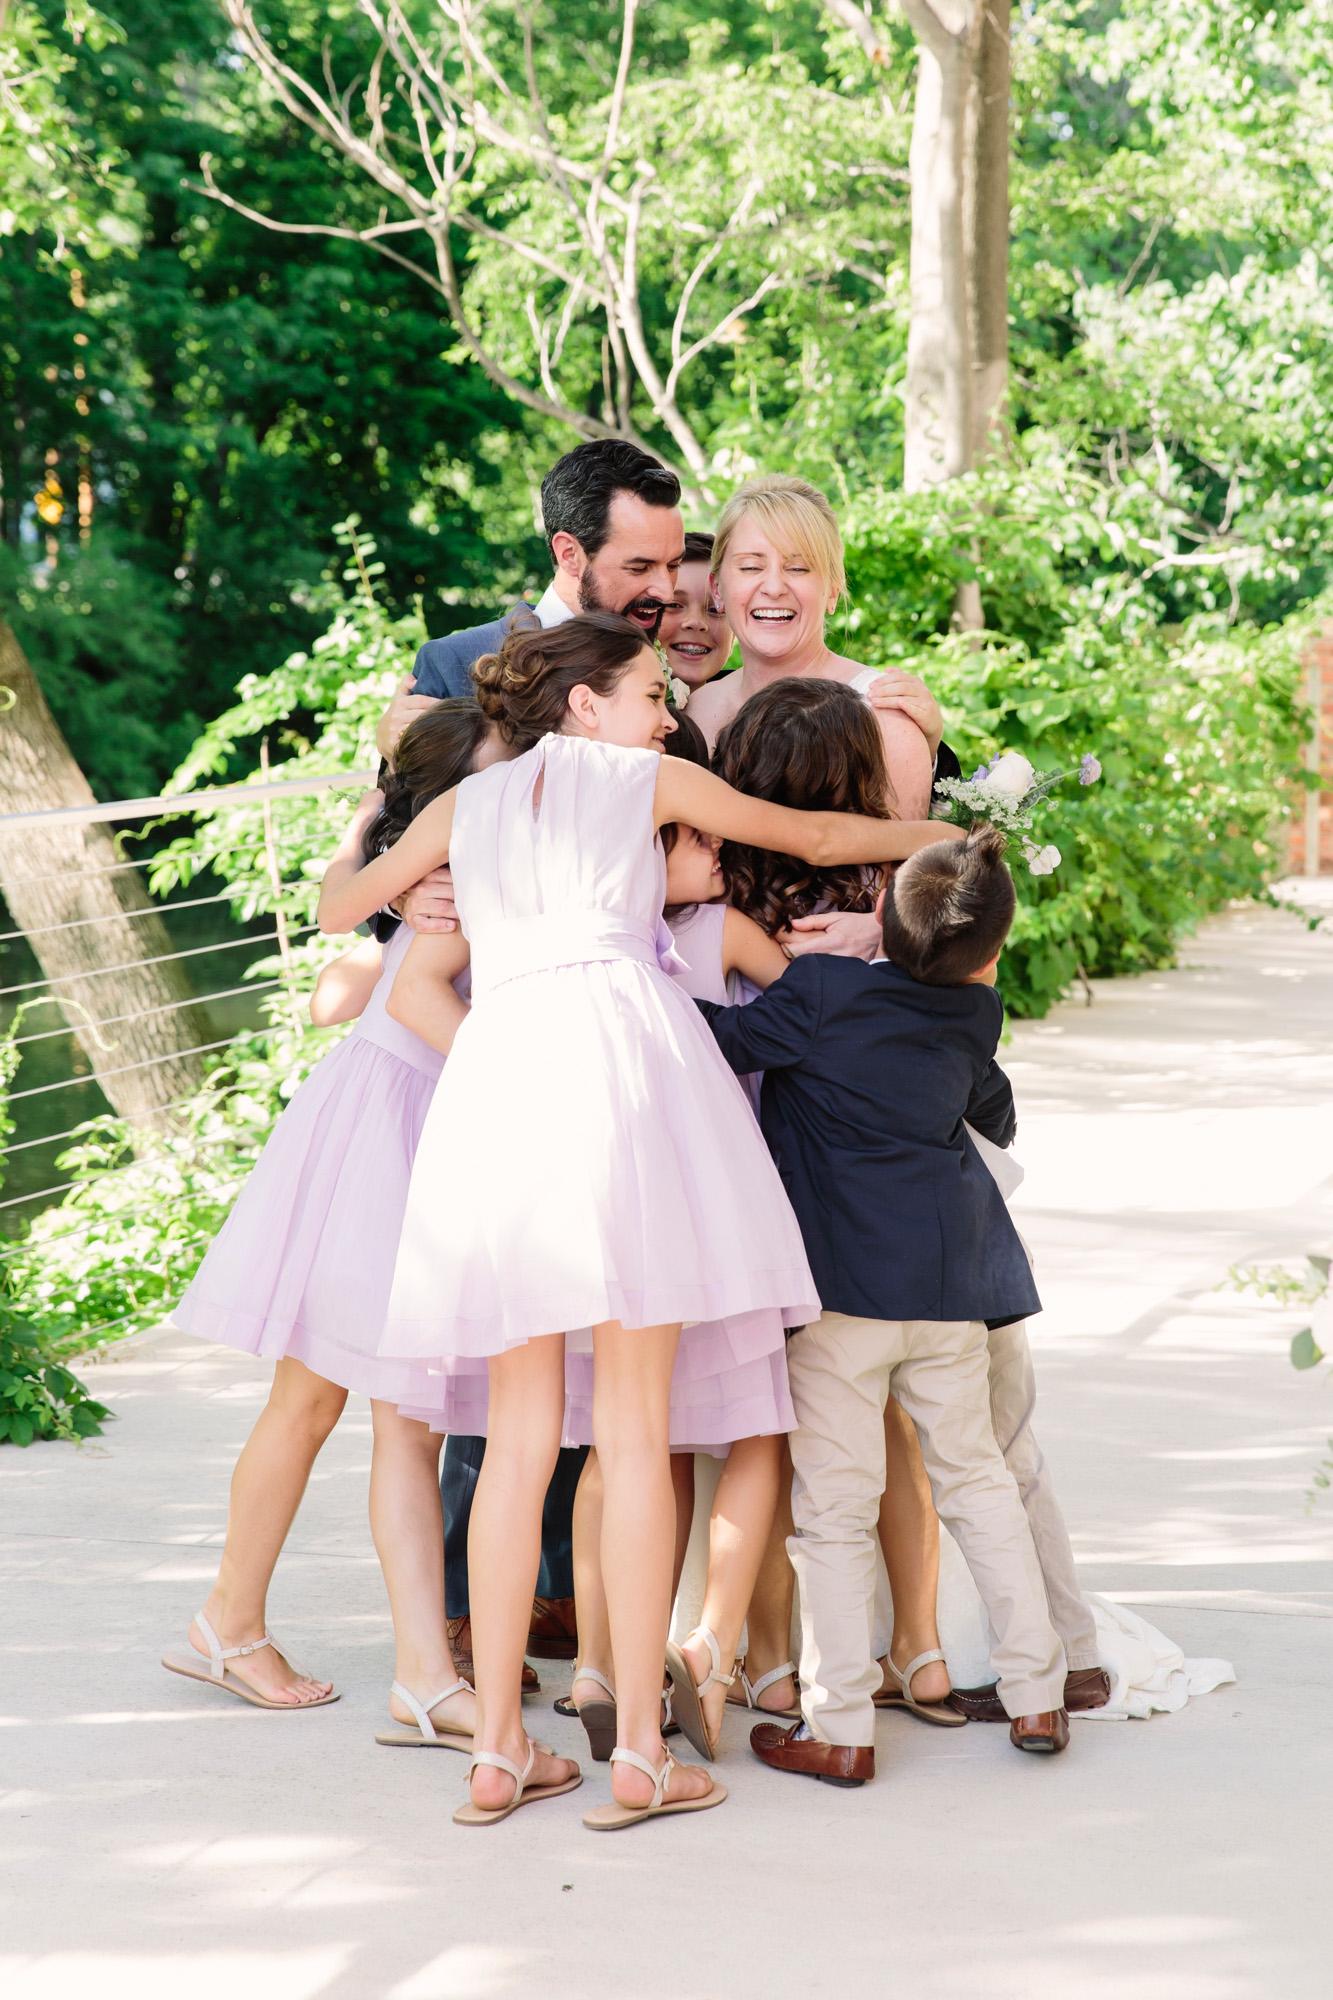 50_Rowan_Brian_The_Roundhouse_Wedding_Beacon_NY_Tanya_Salazar_Photography_617.jpg